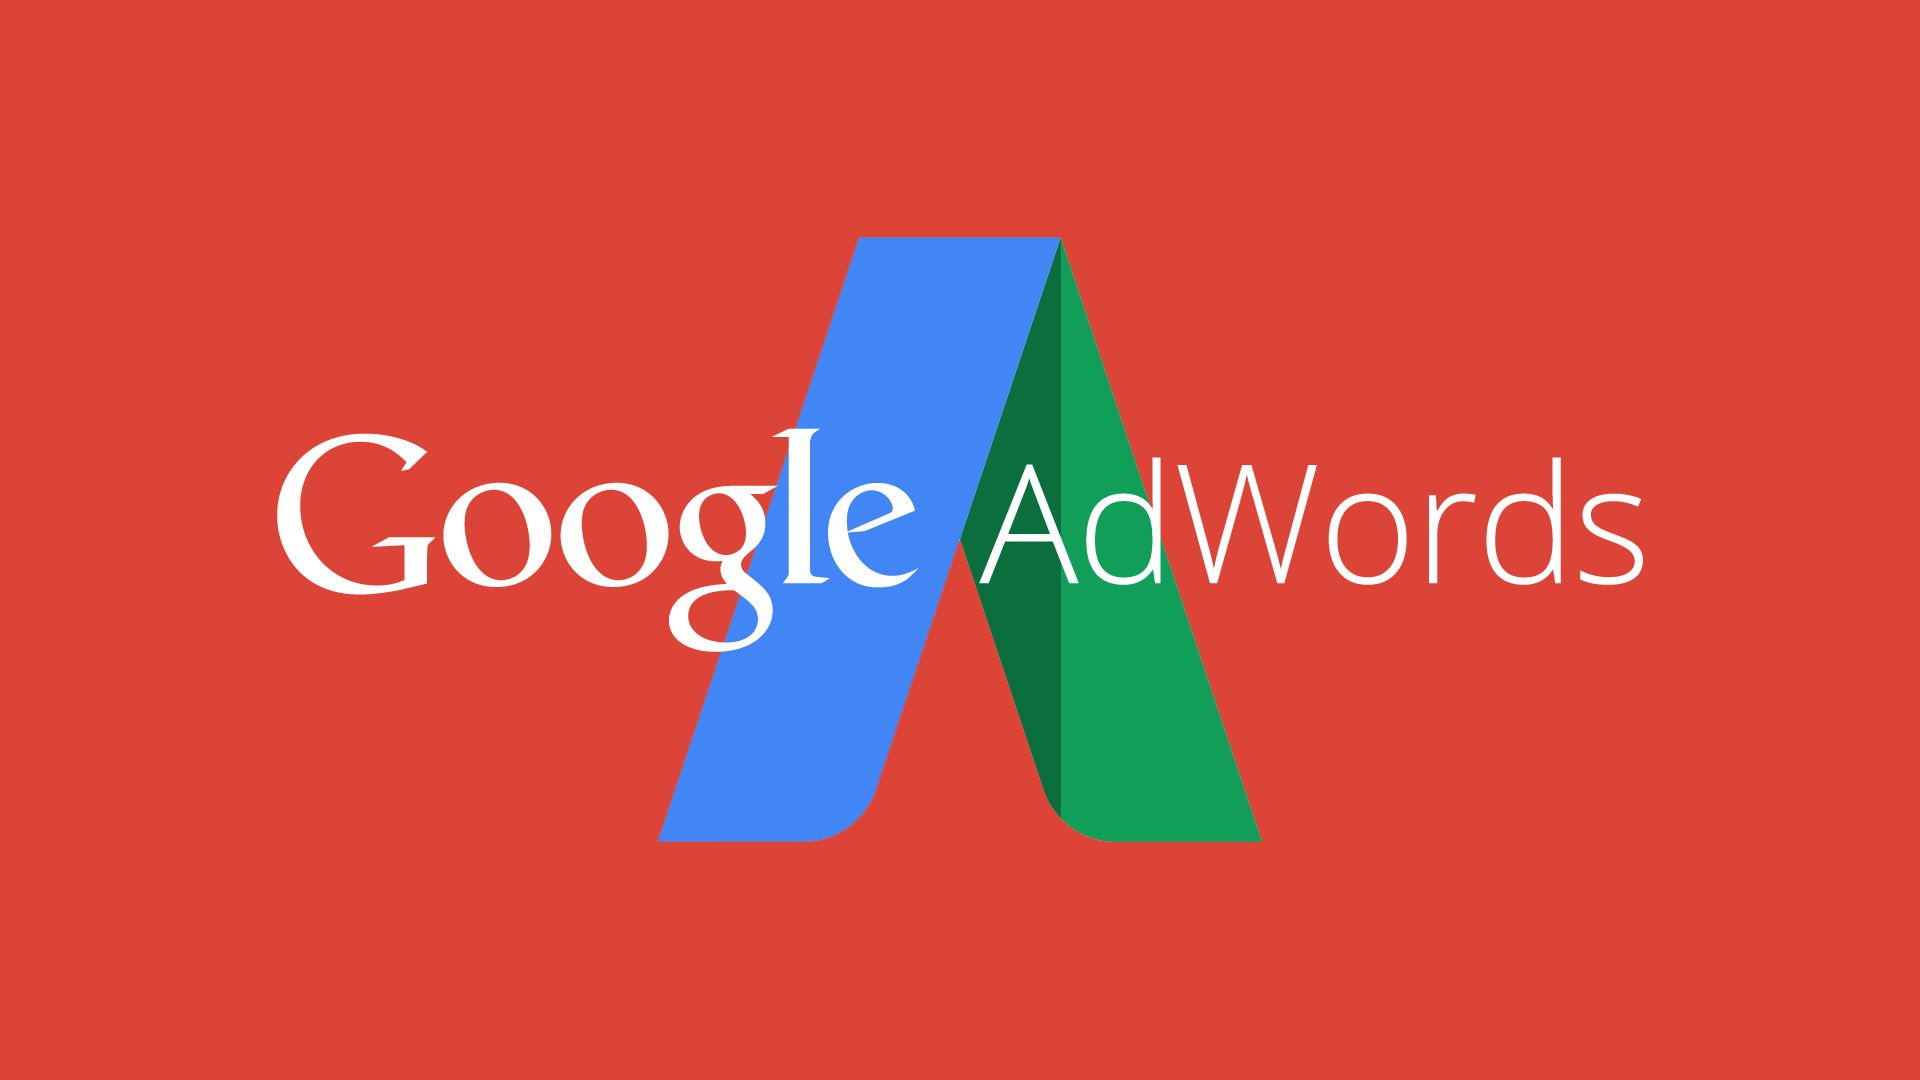 google-adwords-redwhite-1920